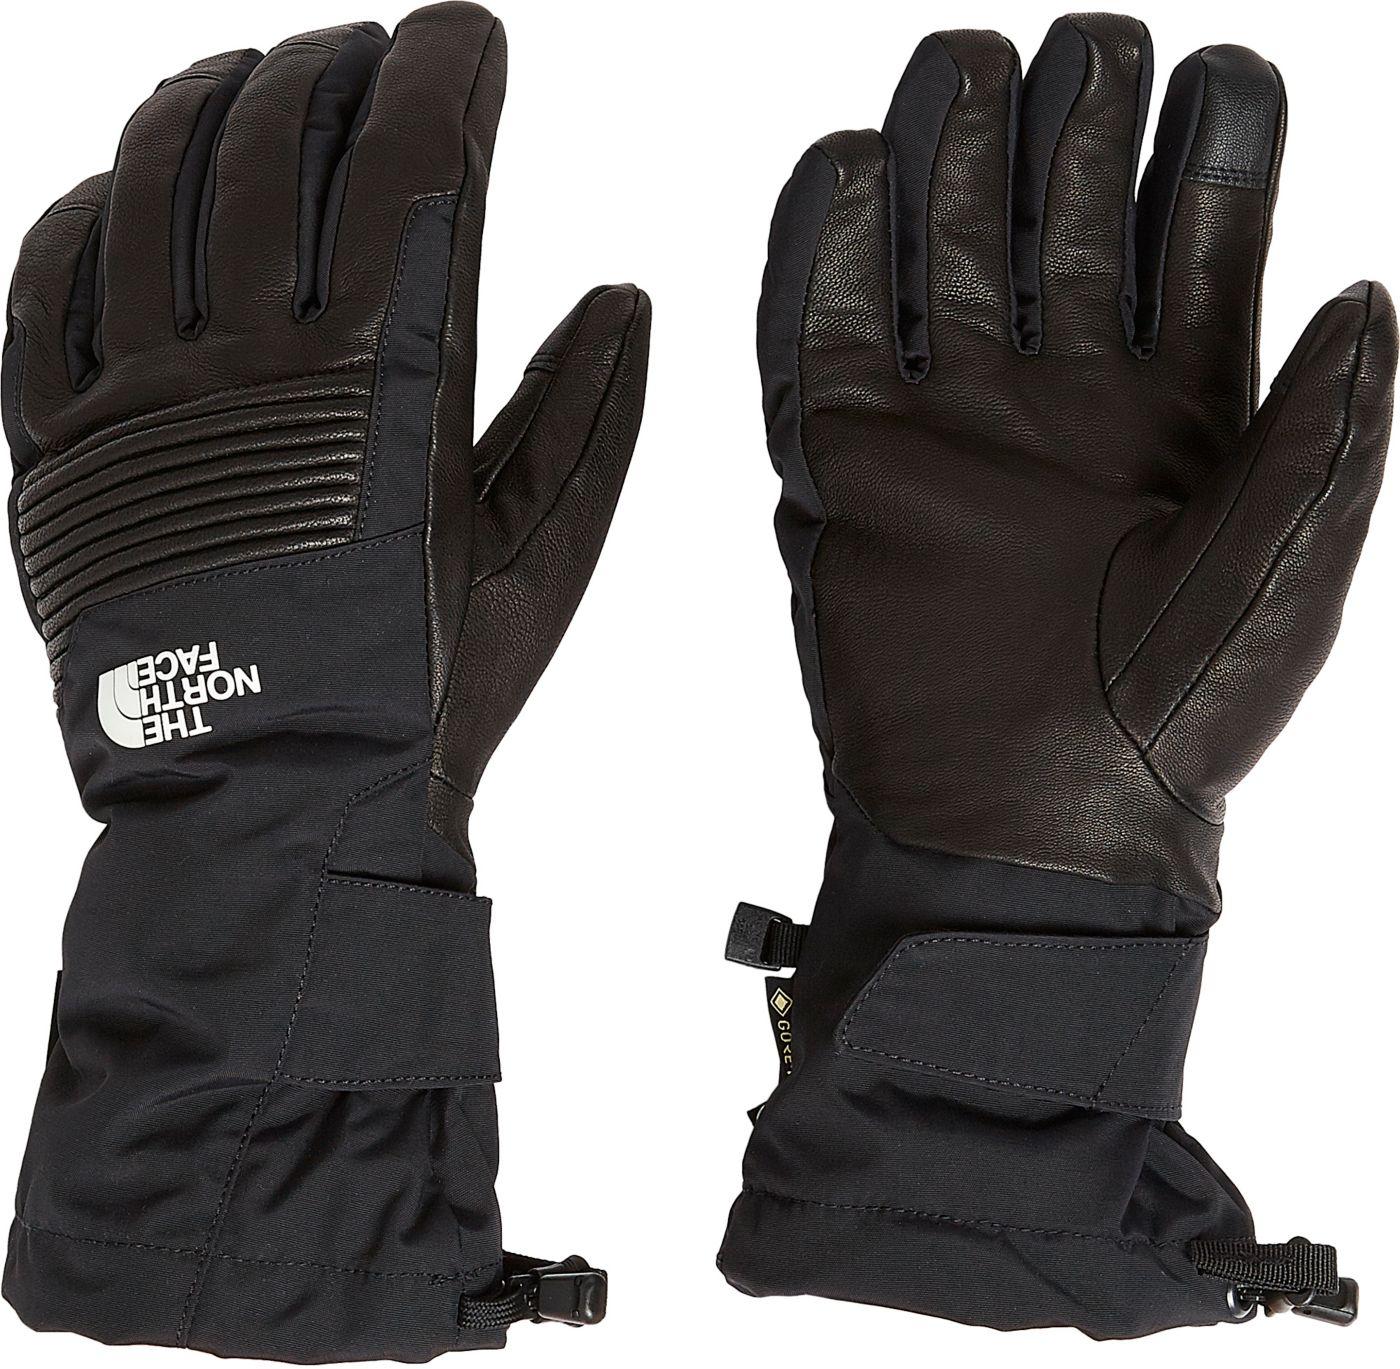 The North Face Men's Powdercloud GORE-TEX Etip Gloves